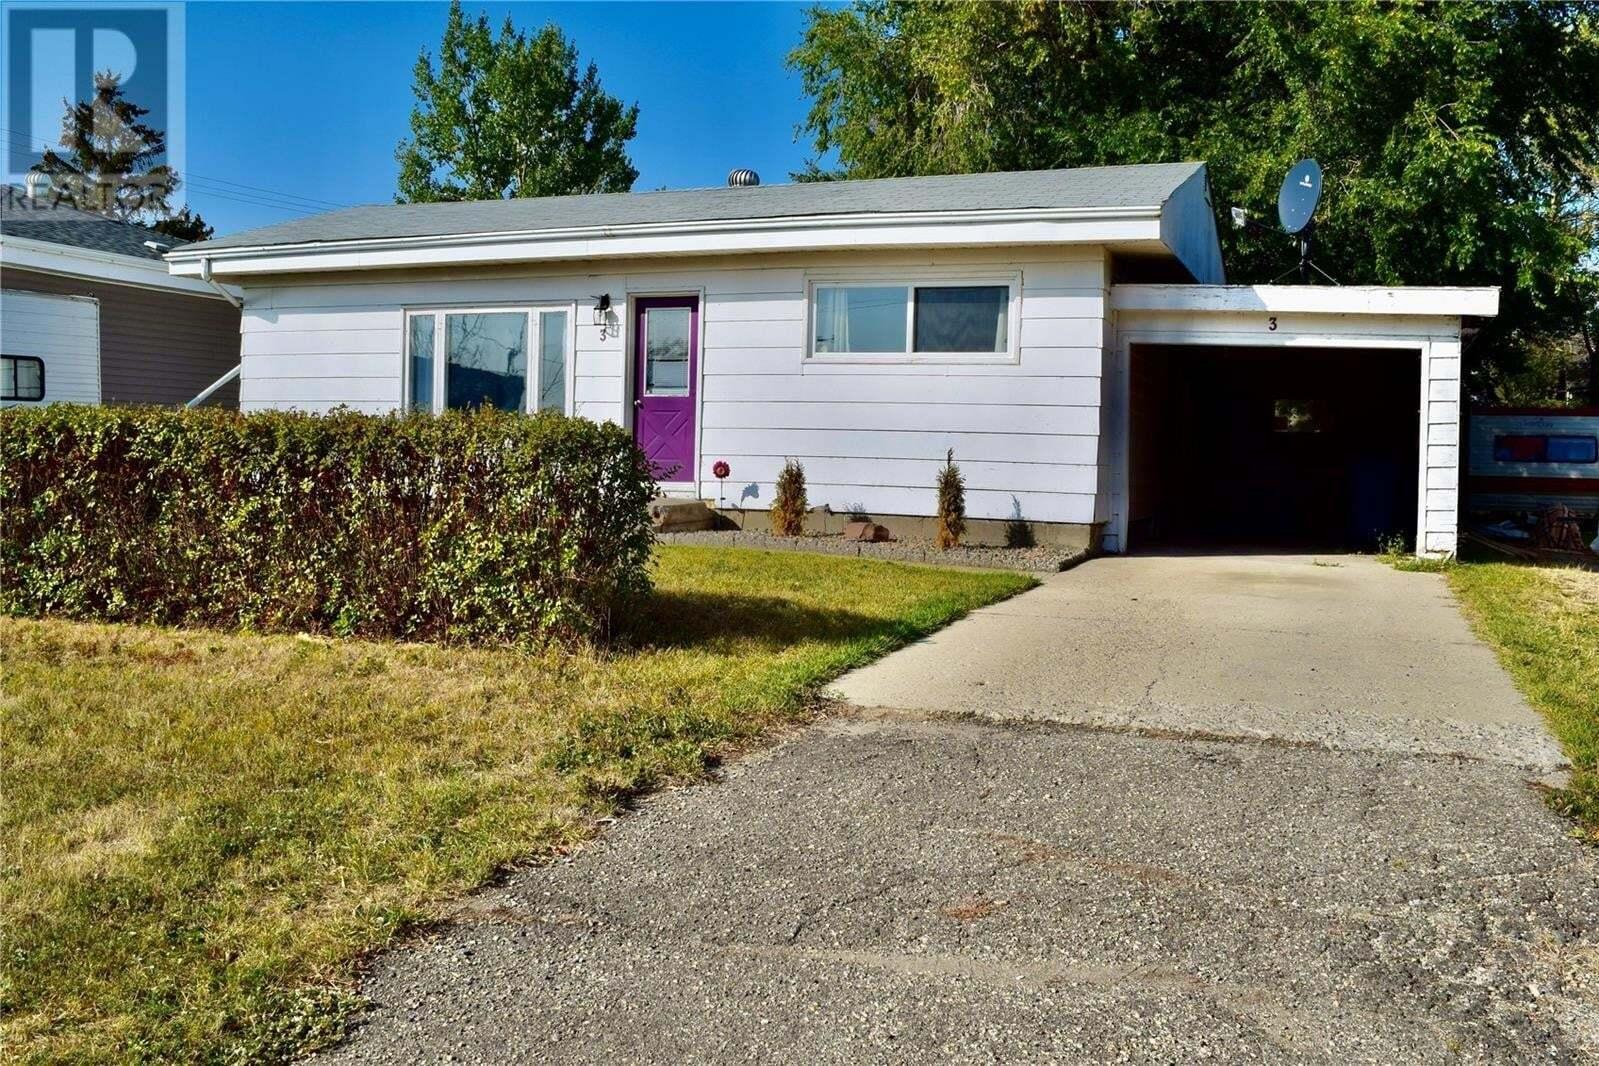 House for sale at 3 Wauchope St Redvers Saskatchewan - MLS: SK827366